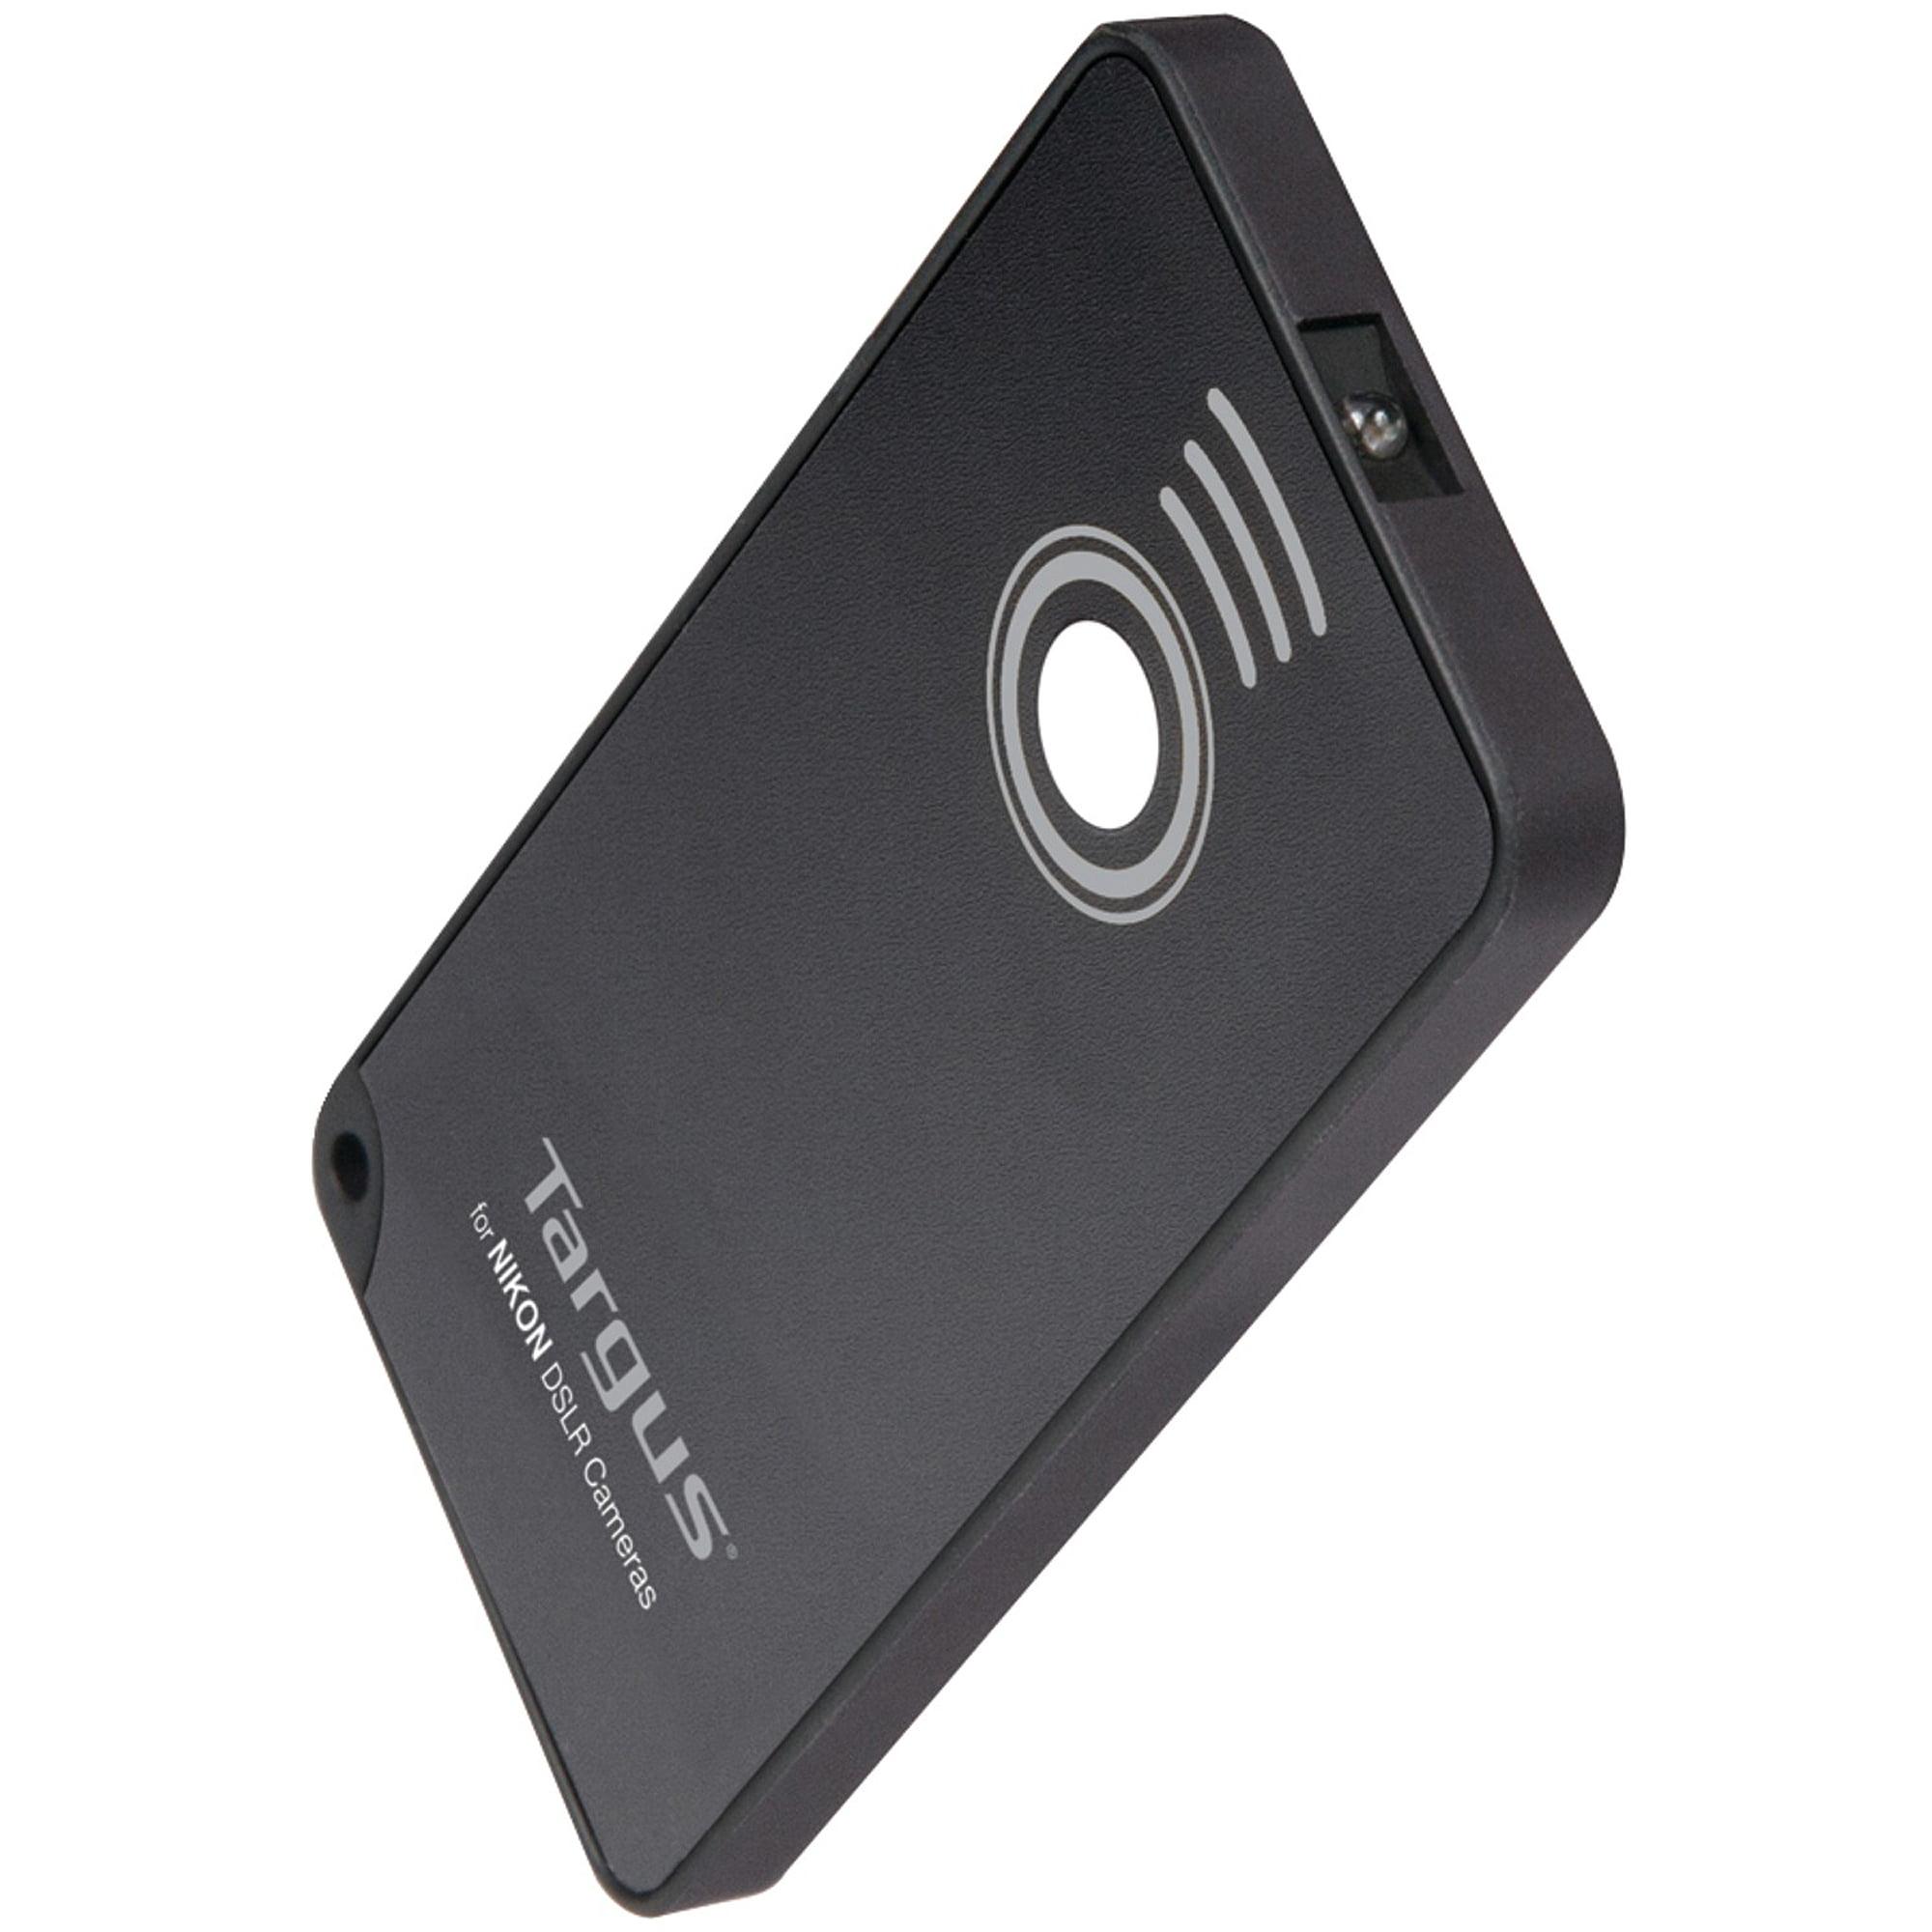 Targus Tg-ni200 Wireless Shutter Release